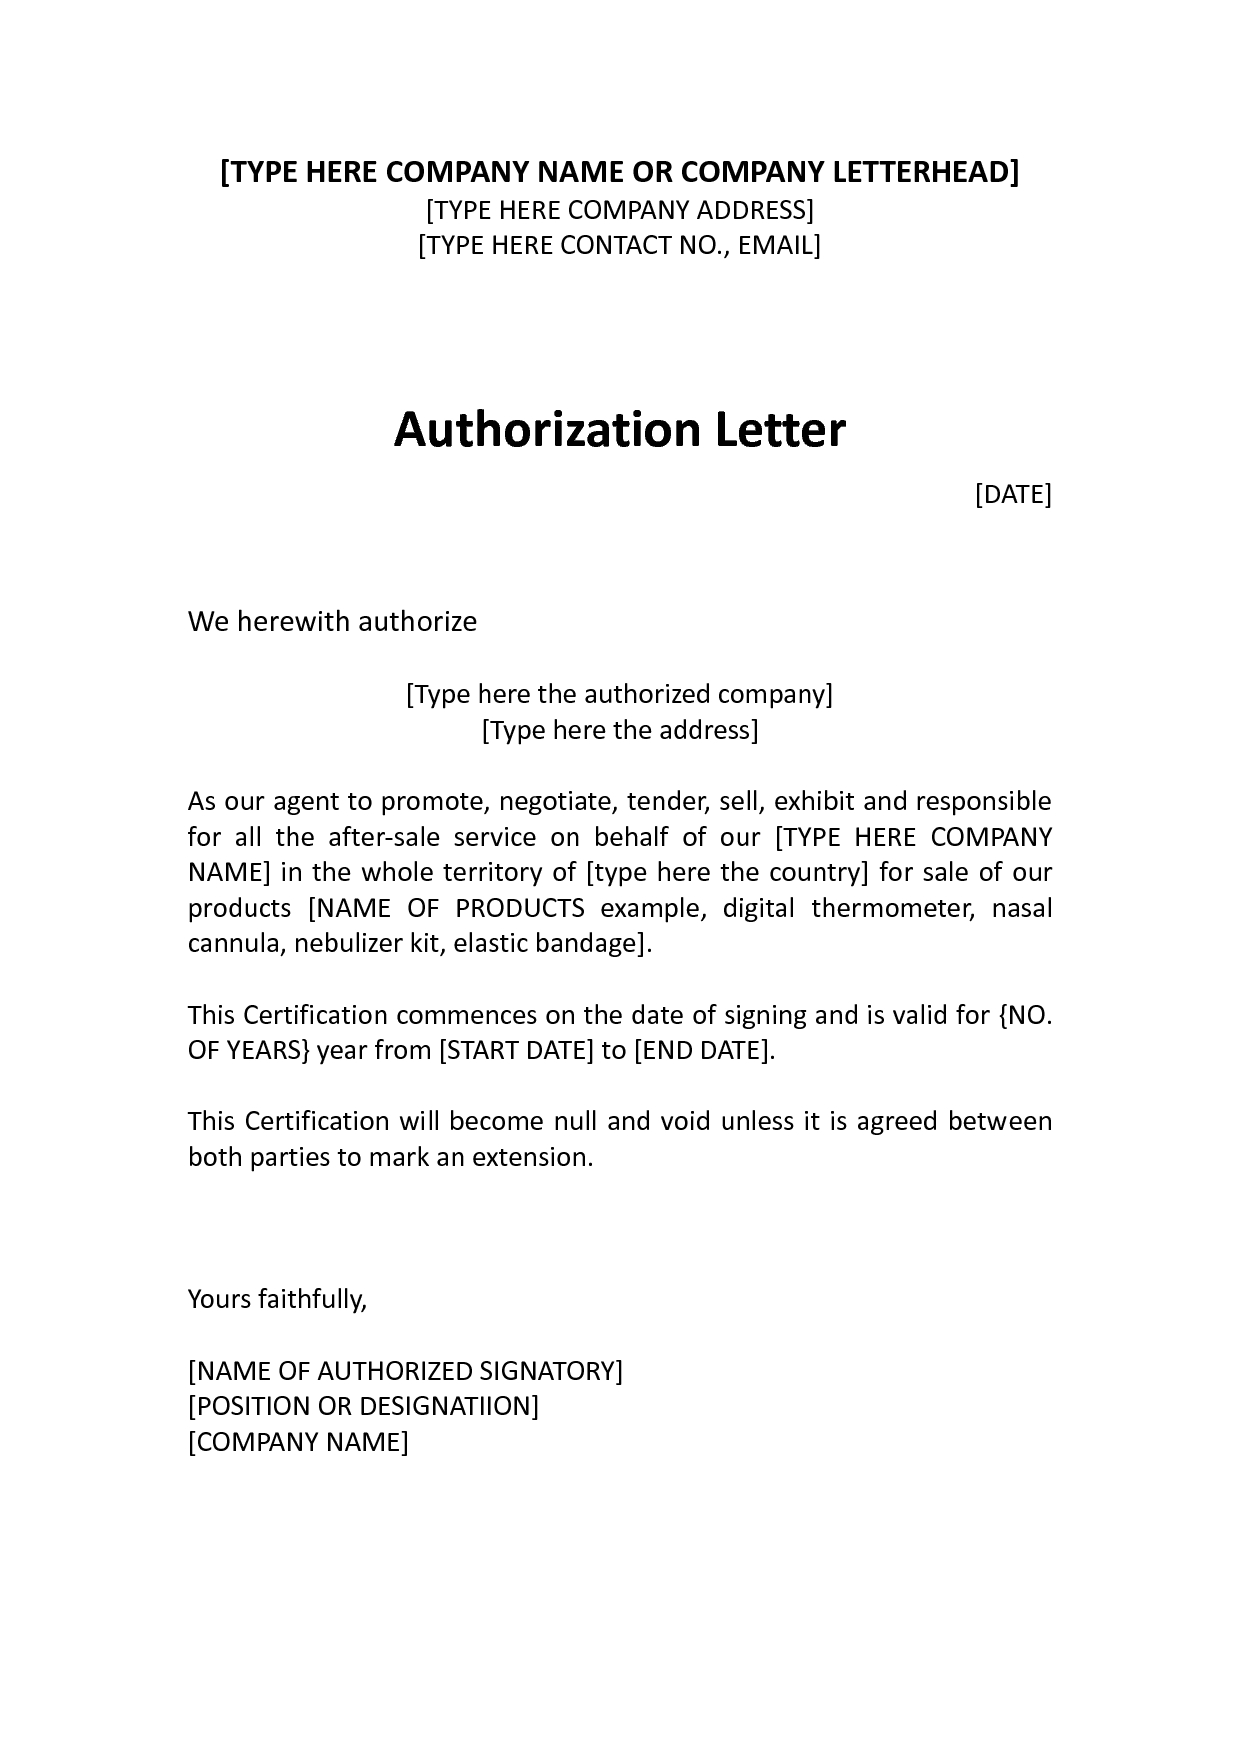 Dentist Appointment Letter Template - Authorization Distributor Letter Sample Distributor Dealer